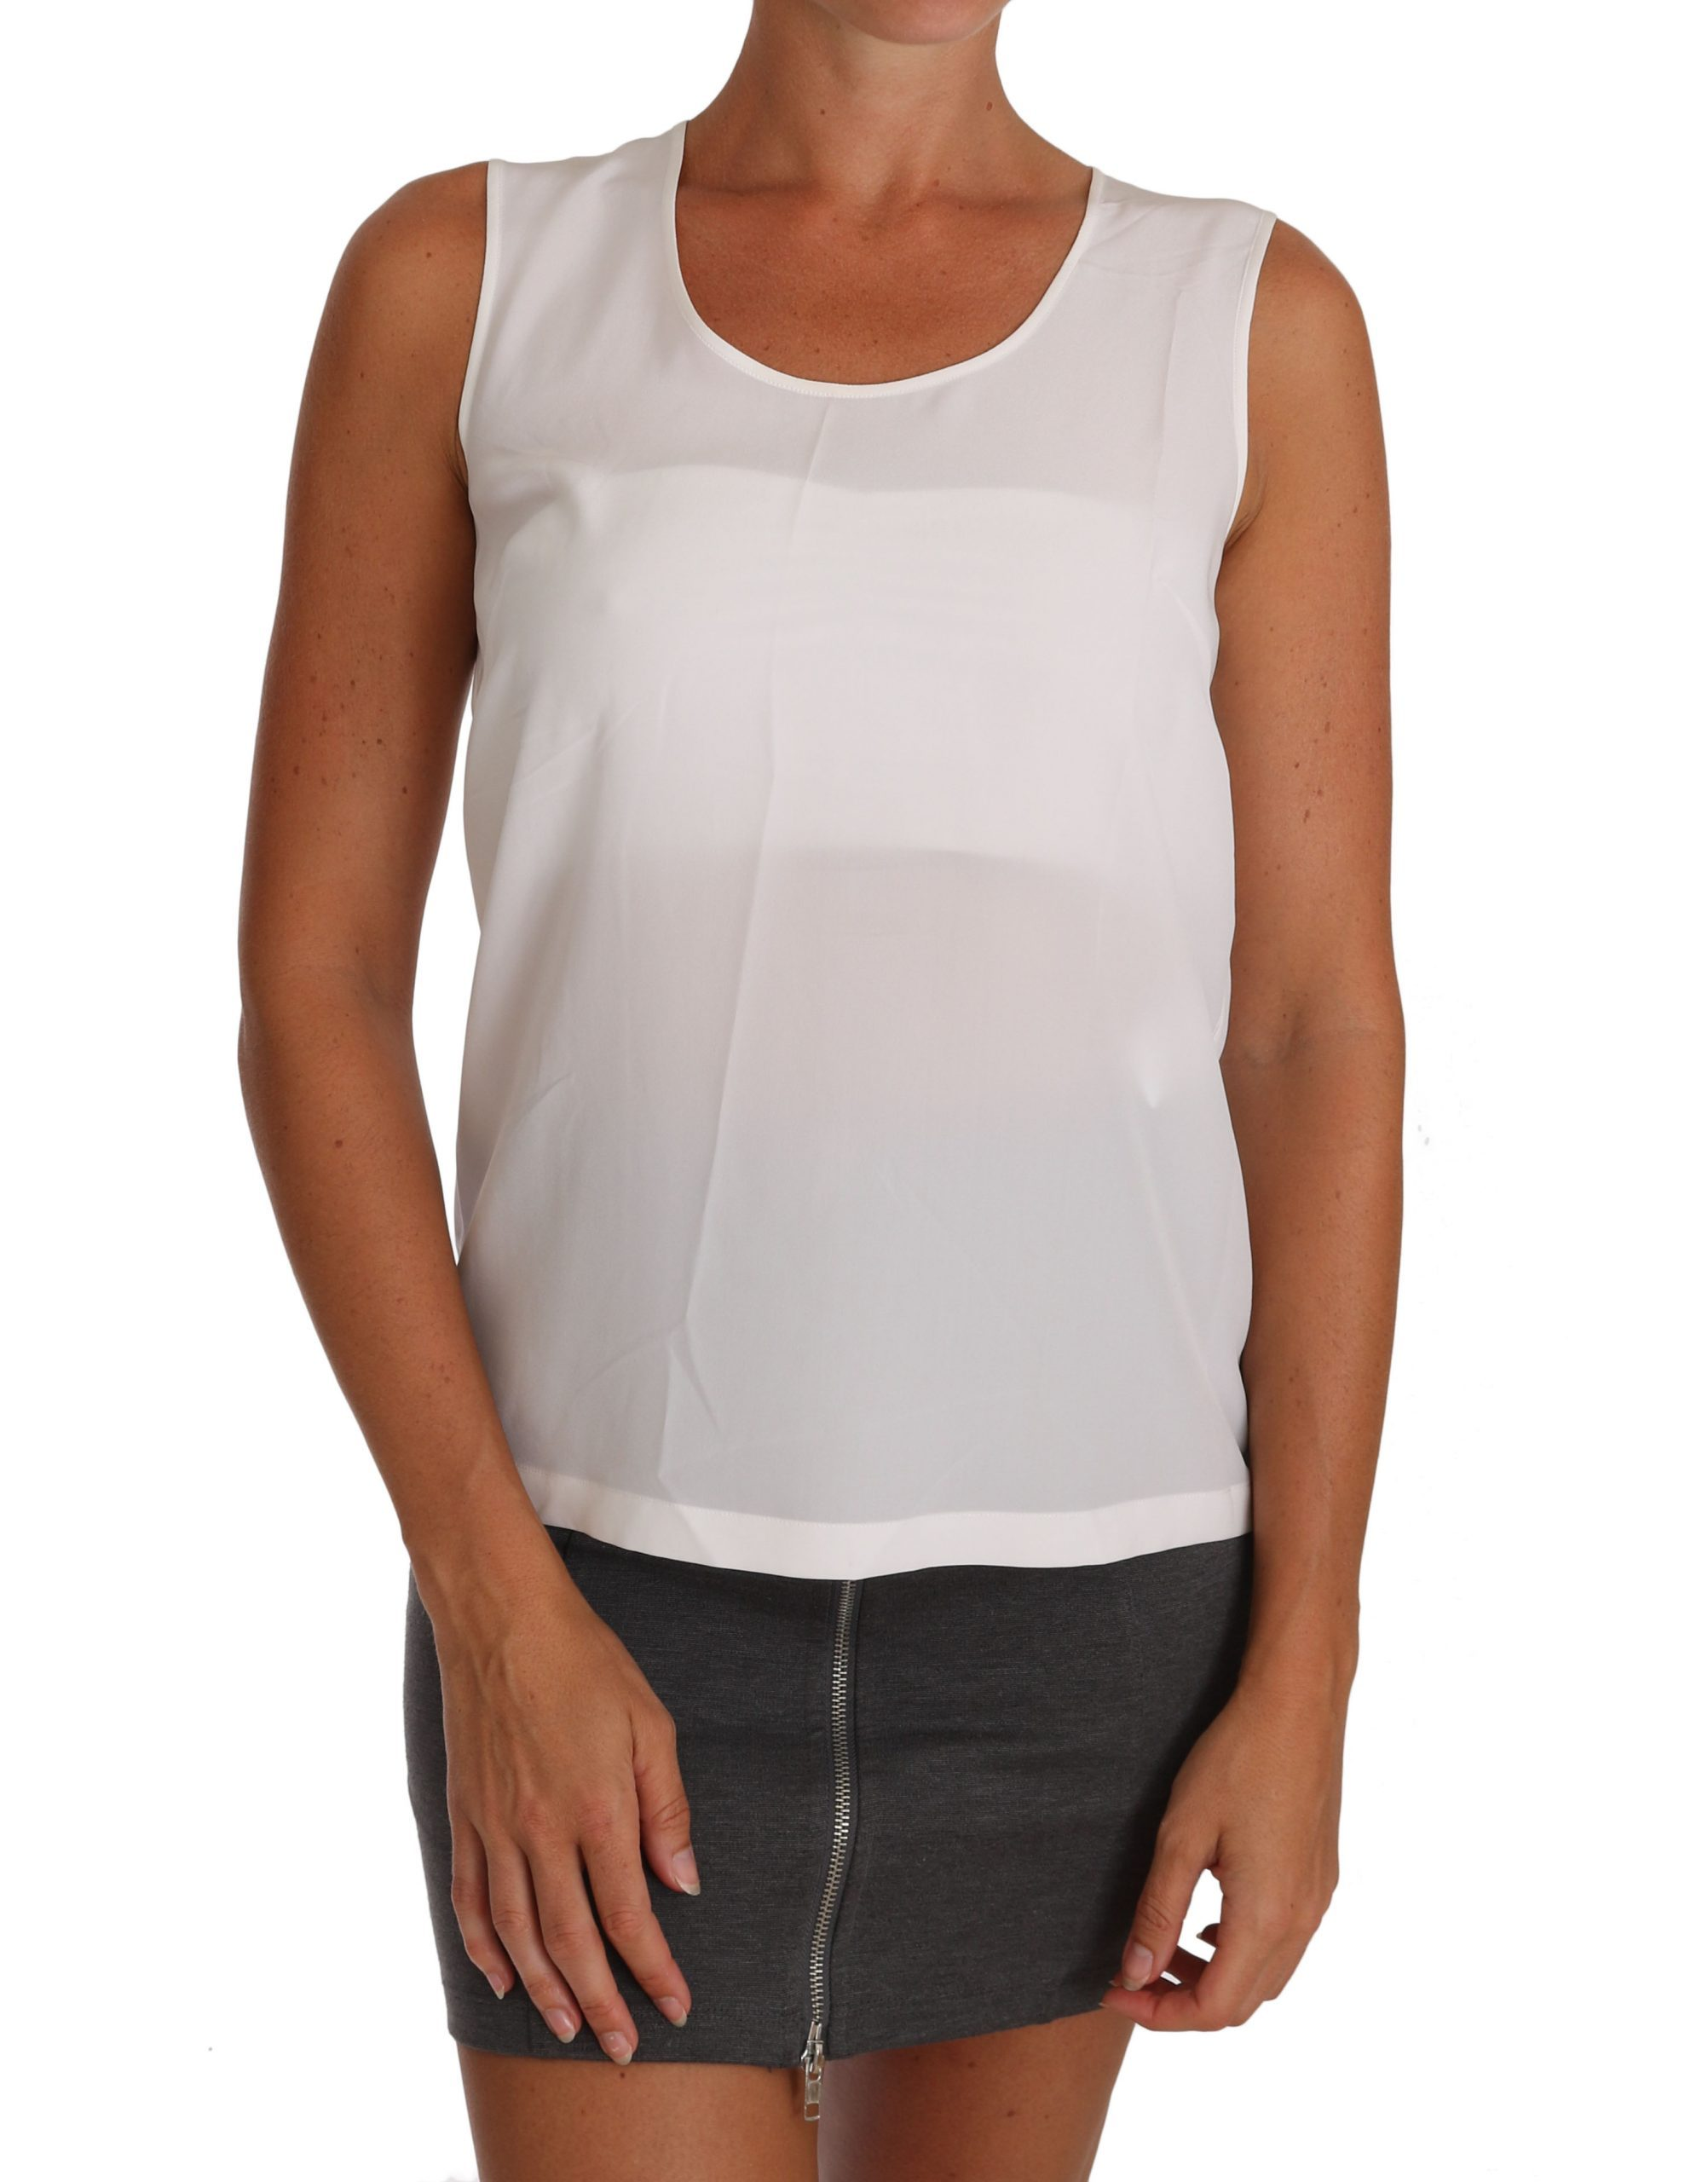 Dolce & Gabbana Women's Silk A-line Sleeveless Tops White TSH2670 - IT36|XXS